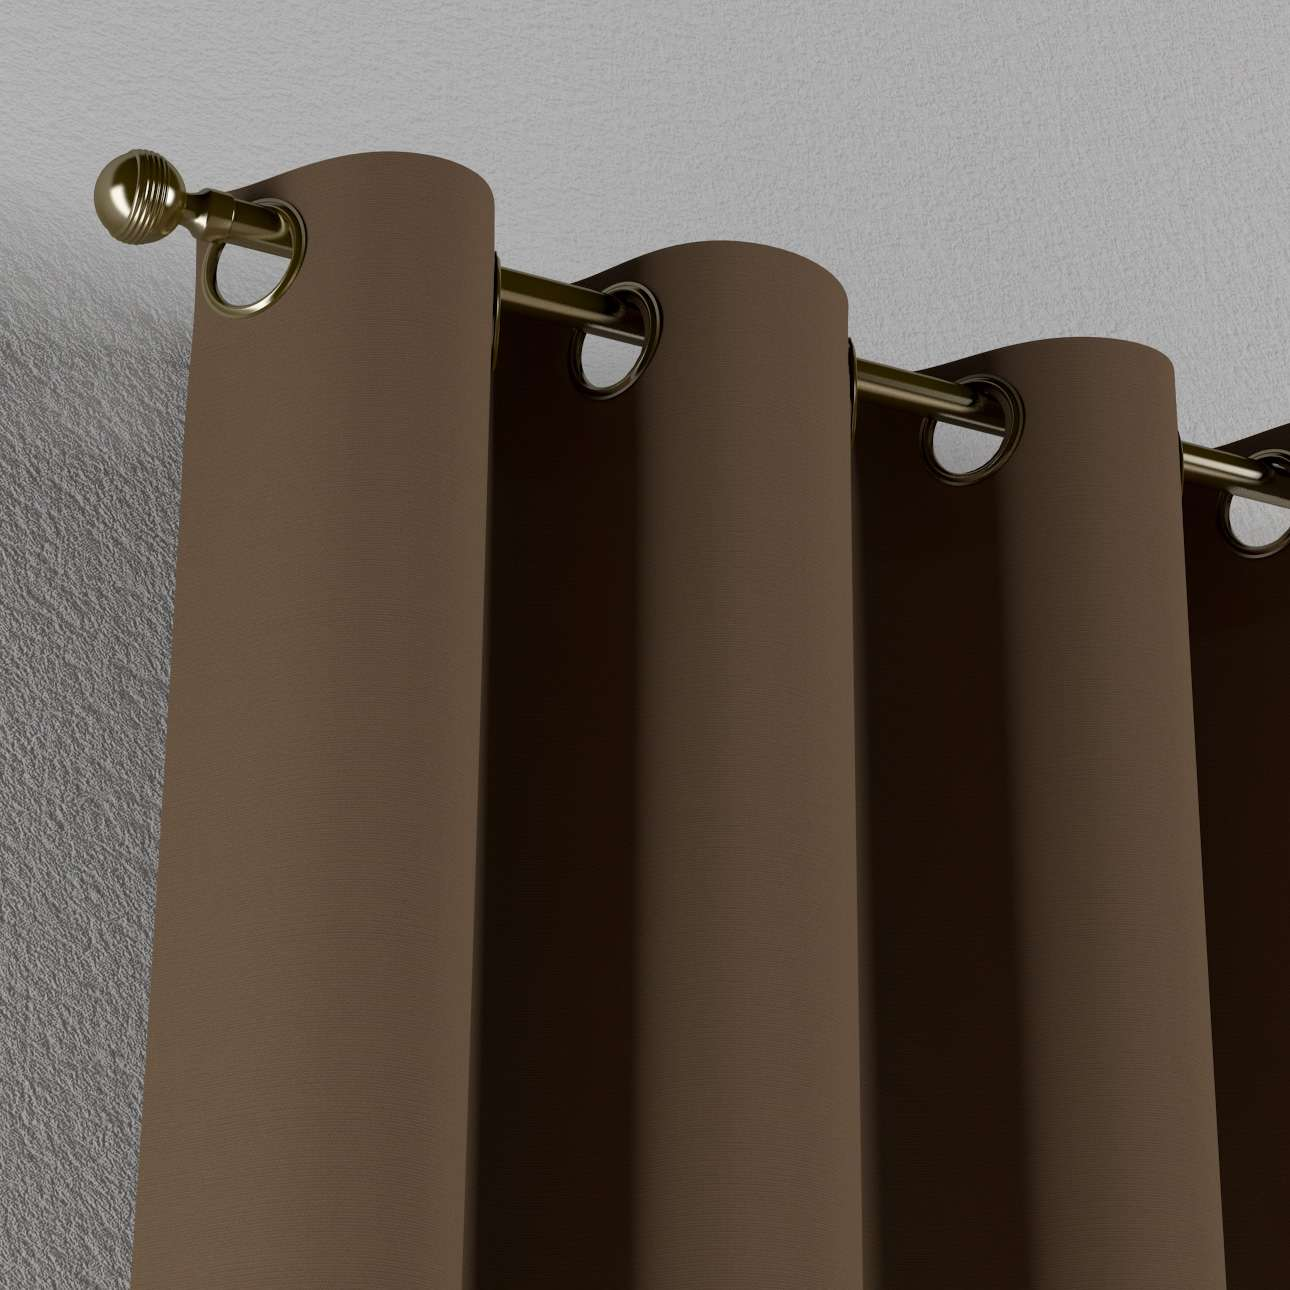 Záves s kolieskami 130 x 260 cm V kolekcii Cotton Panama, tkanina: 702-02